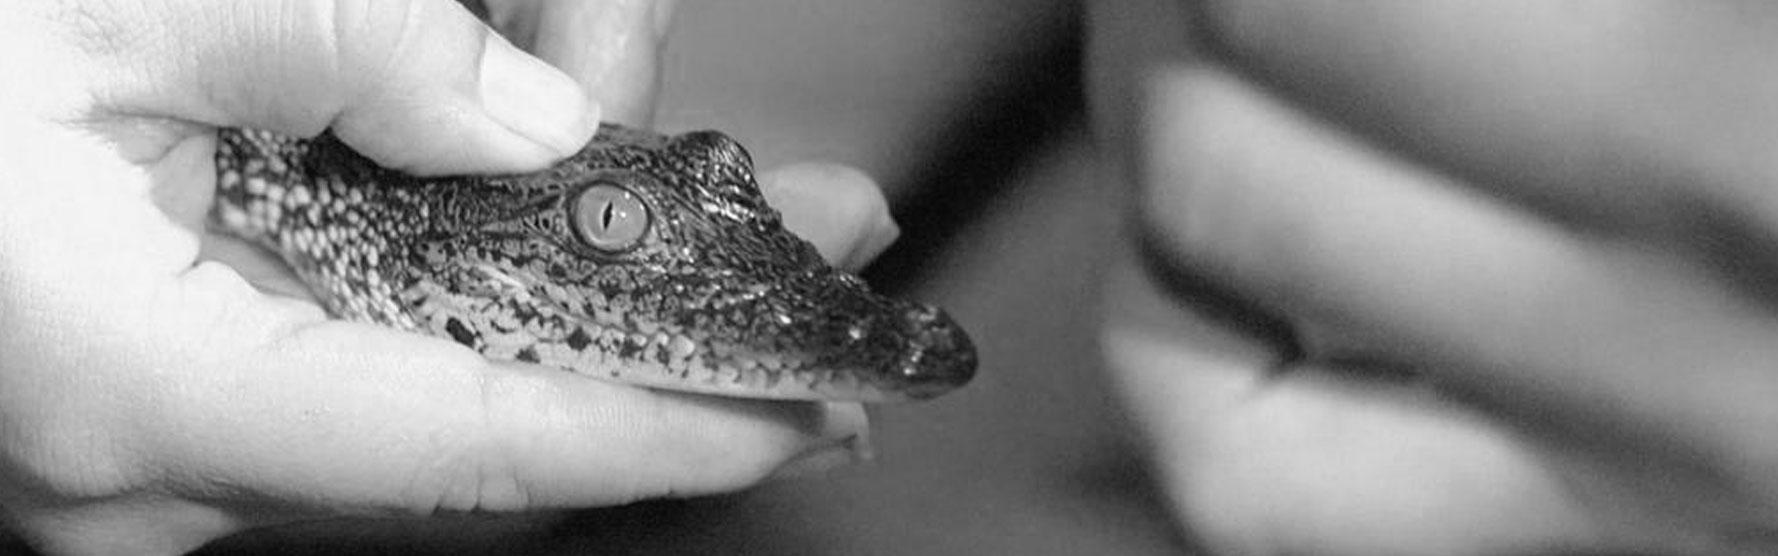 Going Wild: Crocodiles in Belize – Reptiles in Peril